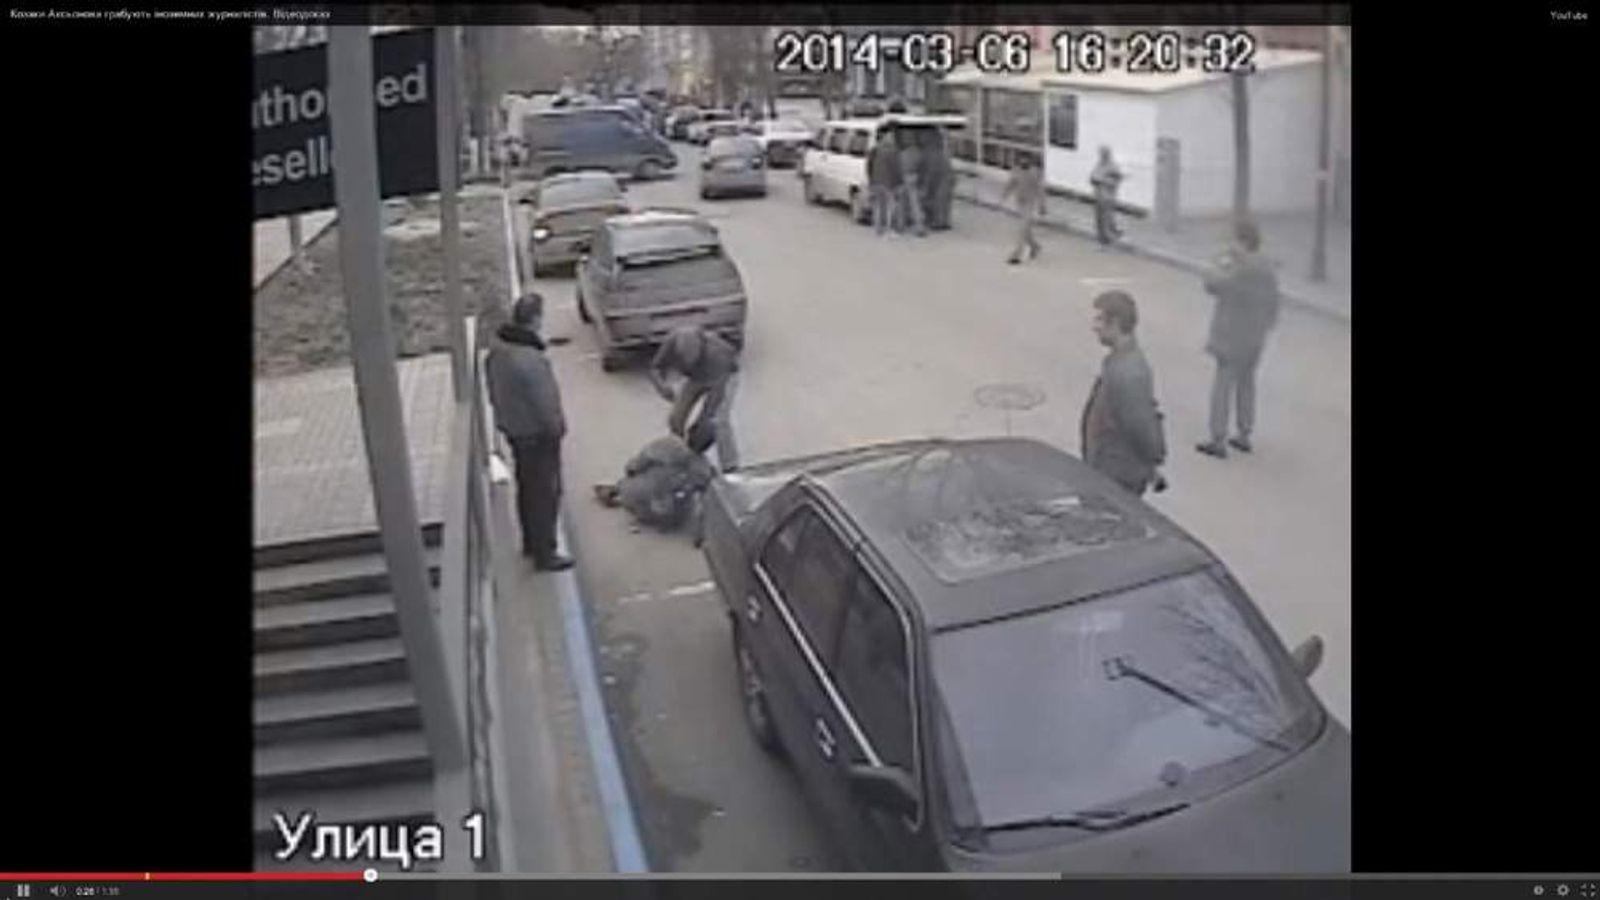 Bulgarian camera crew have their equipment taken away at gunpoint